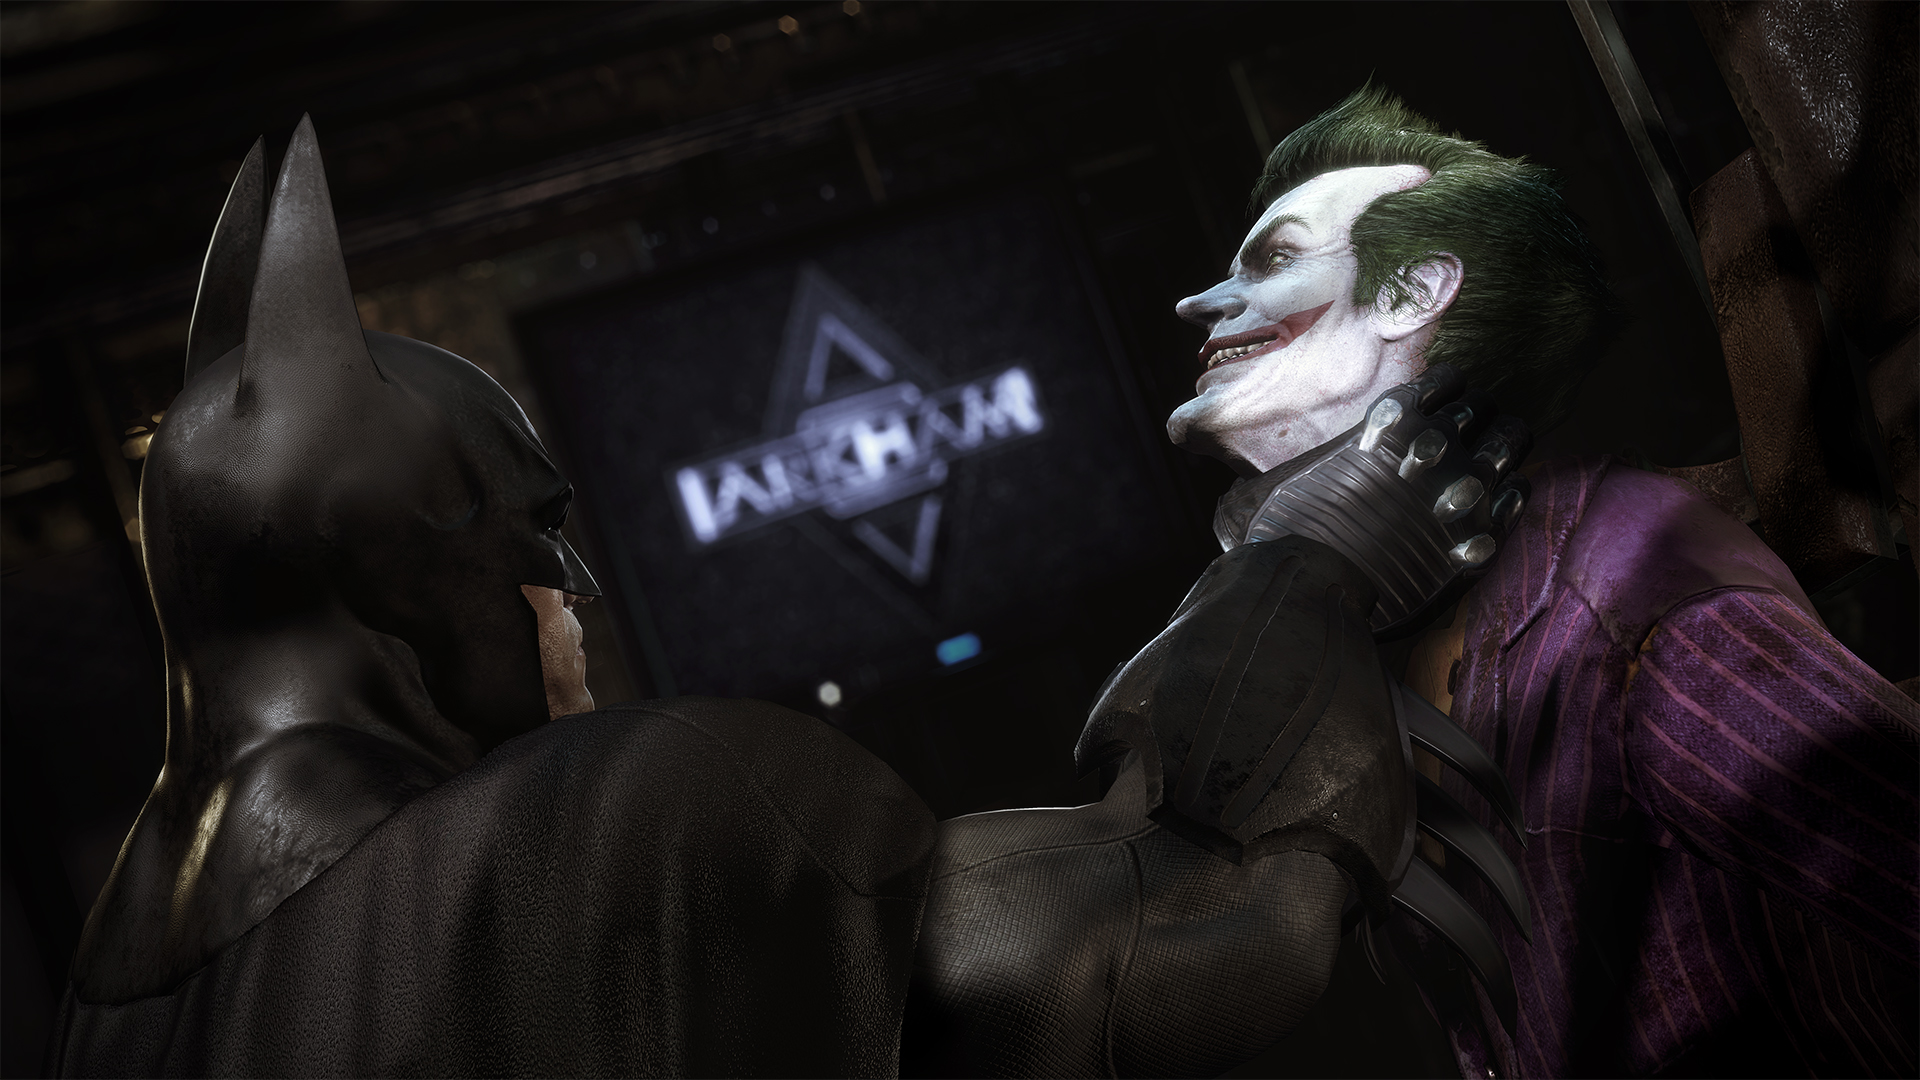 XYmRSRzfXgYvJNAFQtmUWc - Batman: Arkham Asylum is 10 – Rocksteady founders on the genre-defining superhero game